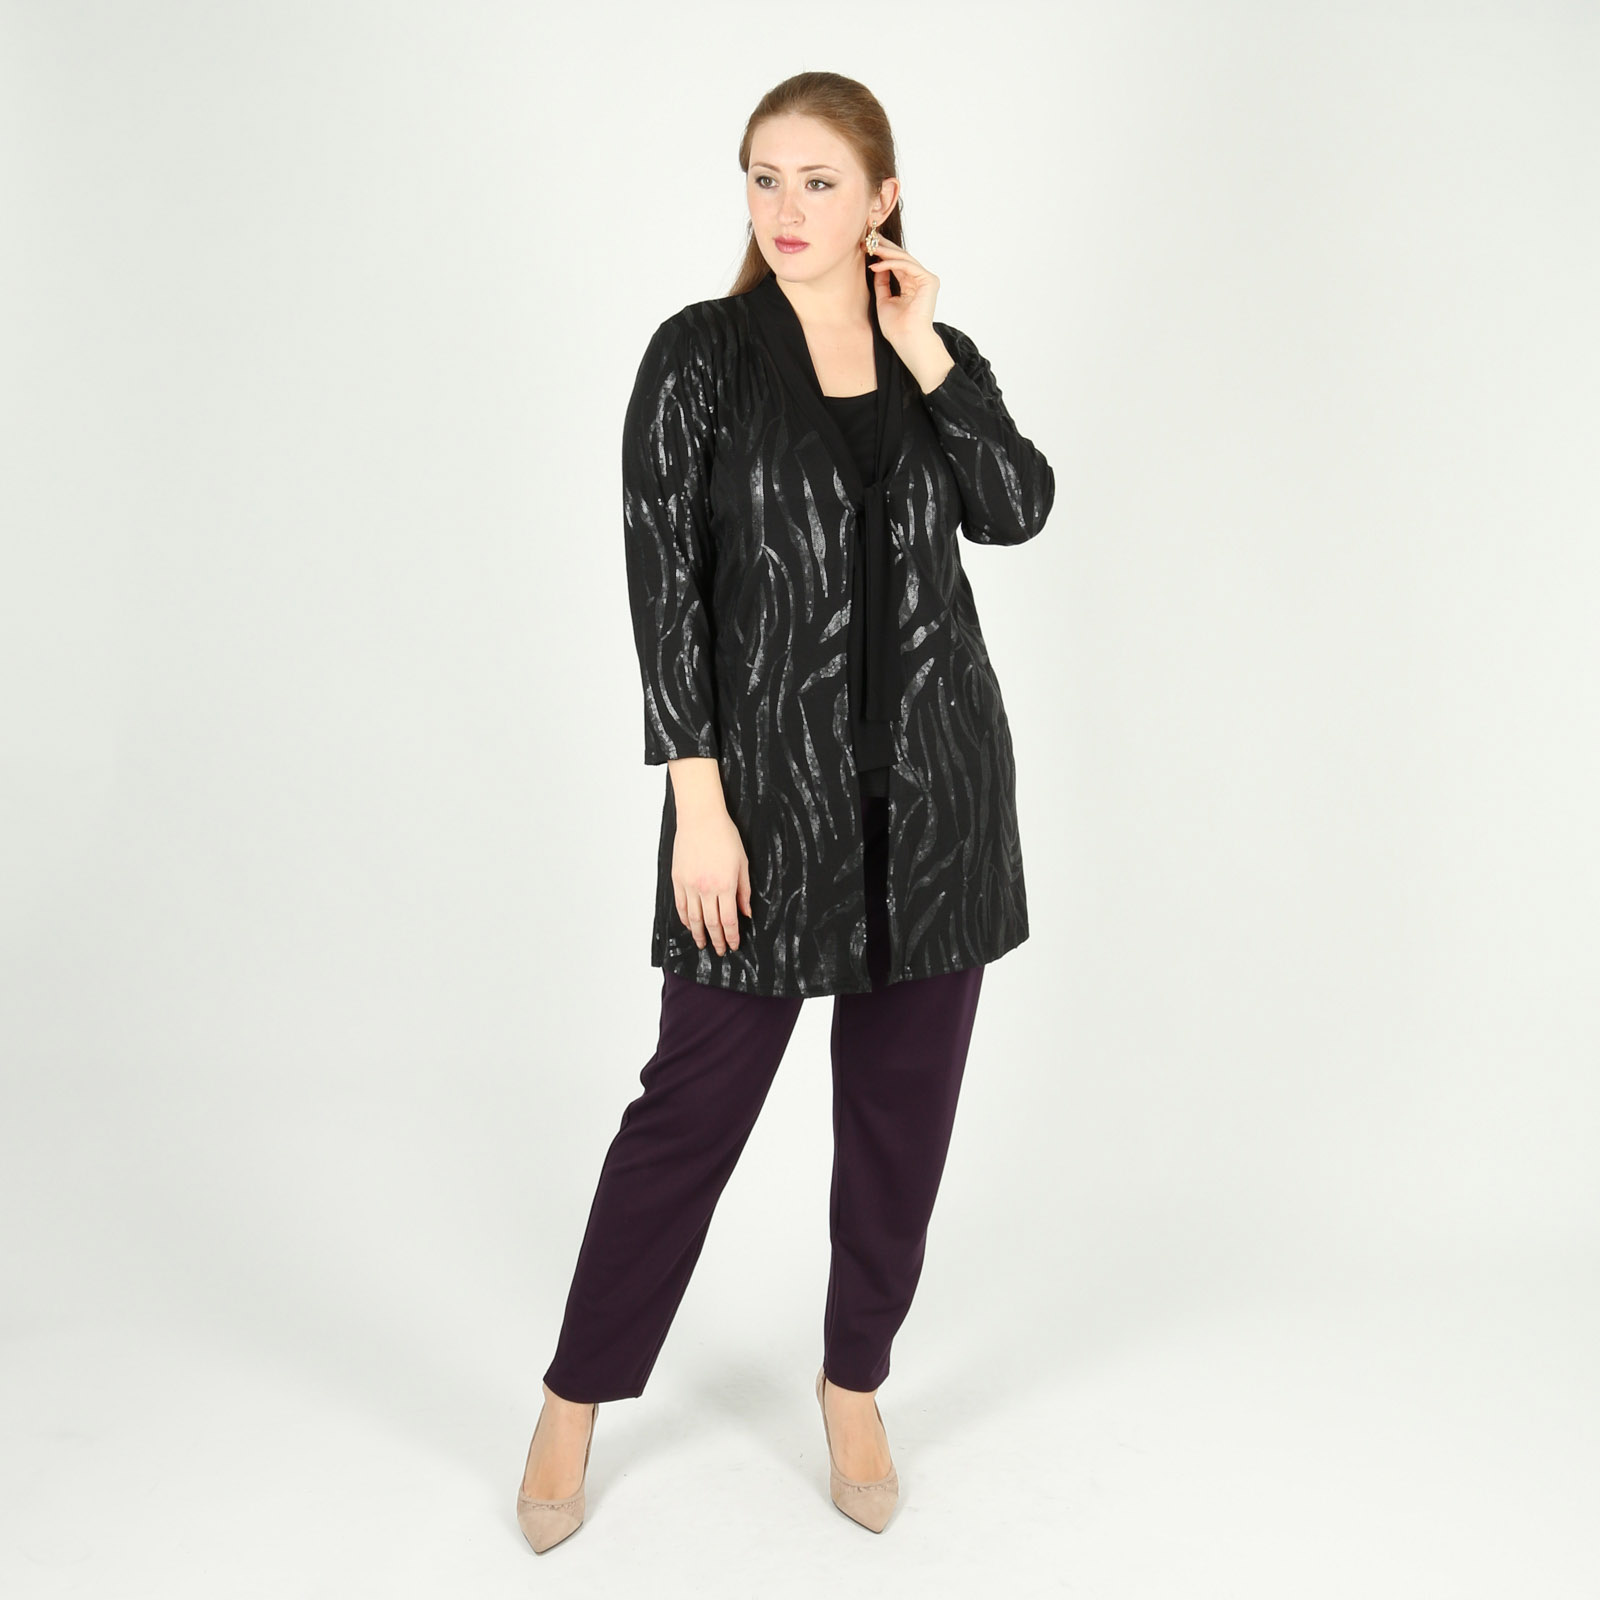 Комплект: блуза и кардиган с пайетками